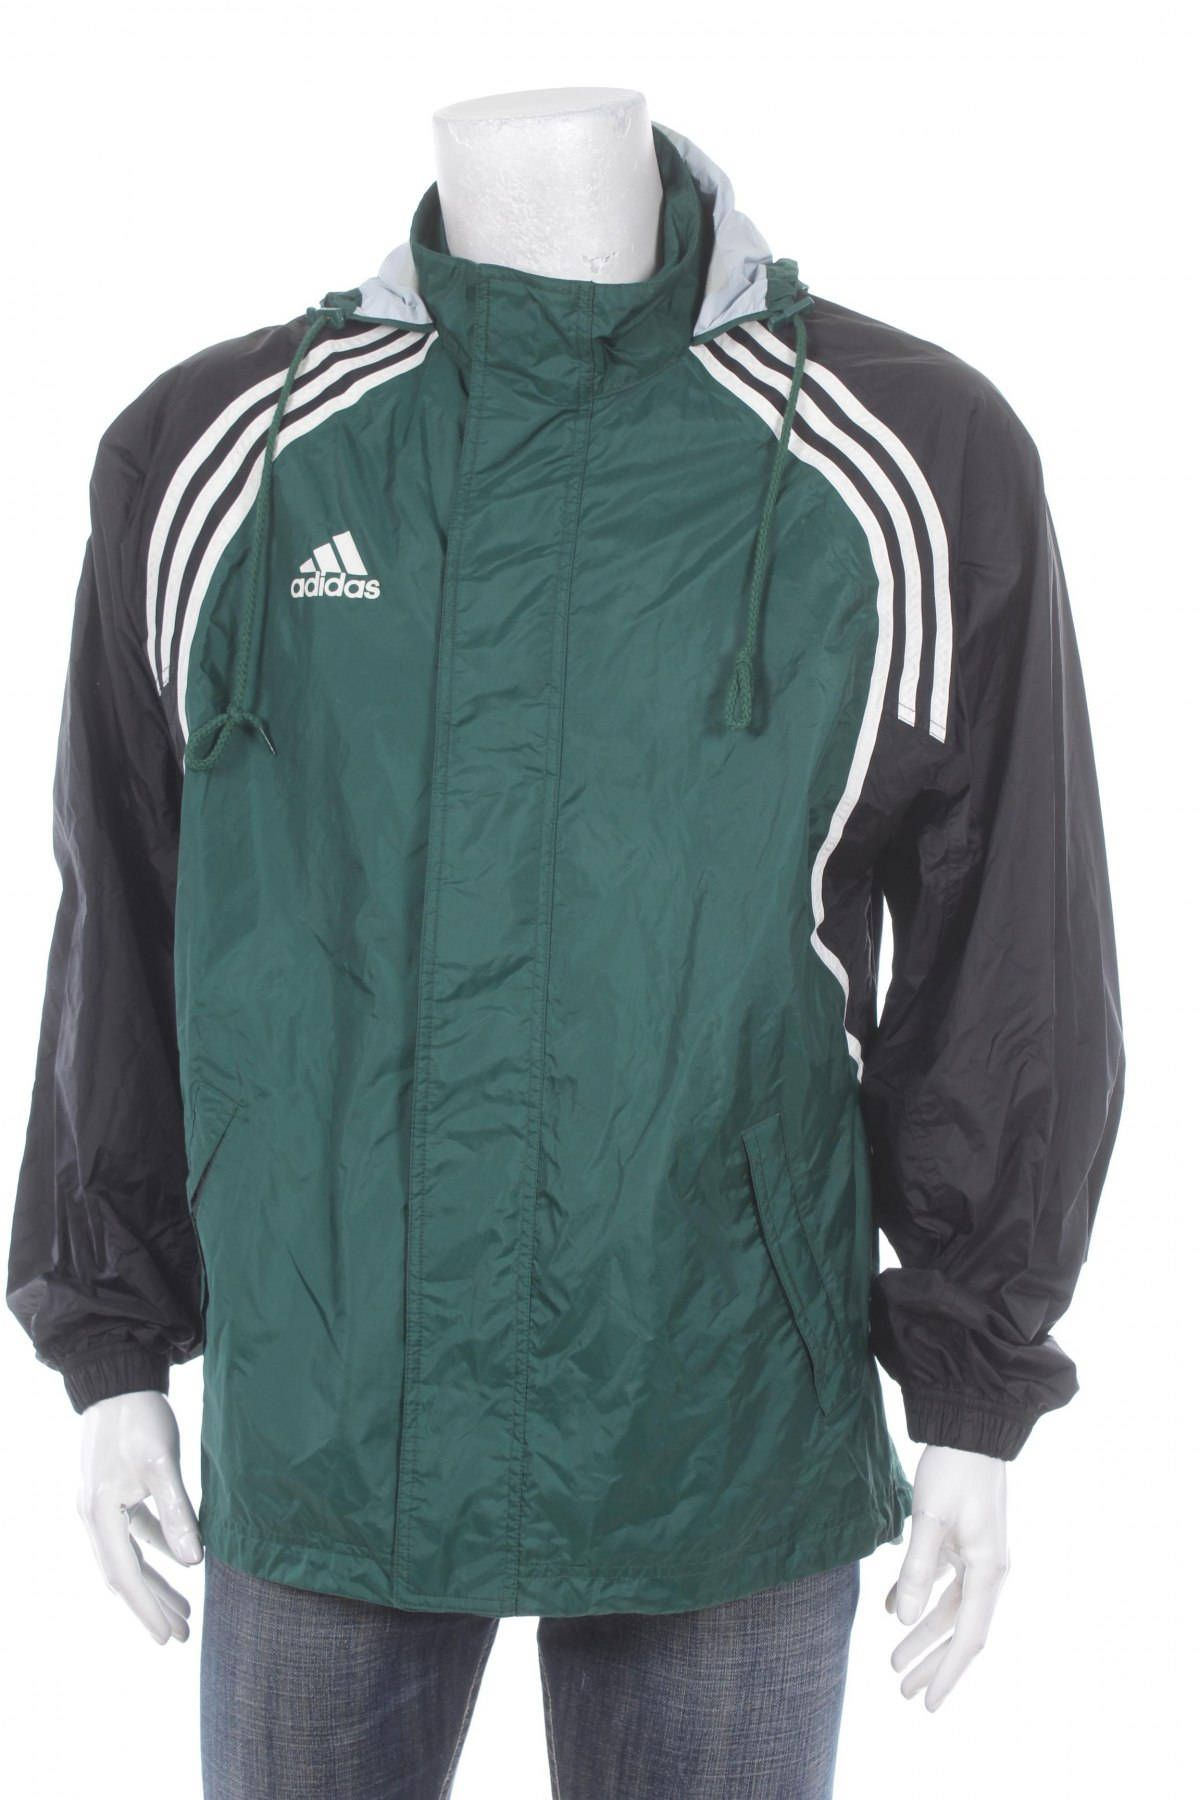 2d147dac6d214 Vintage 90s Adidas windbreaker jacket Multicolor Green/Black/White ...